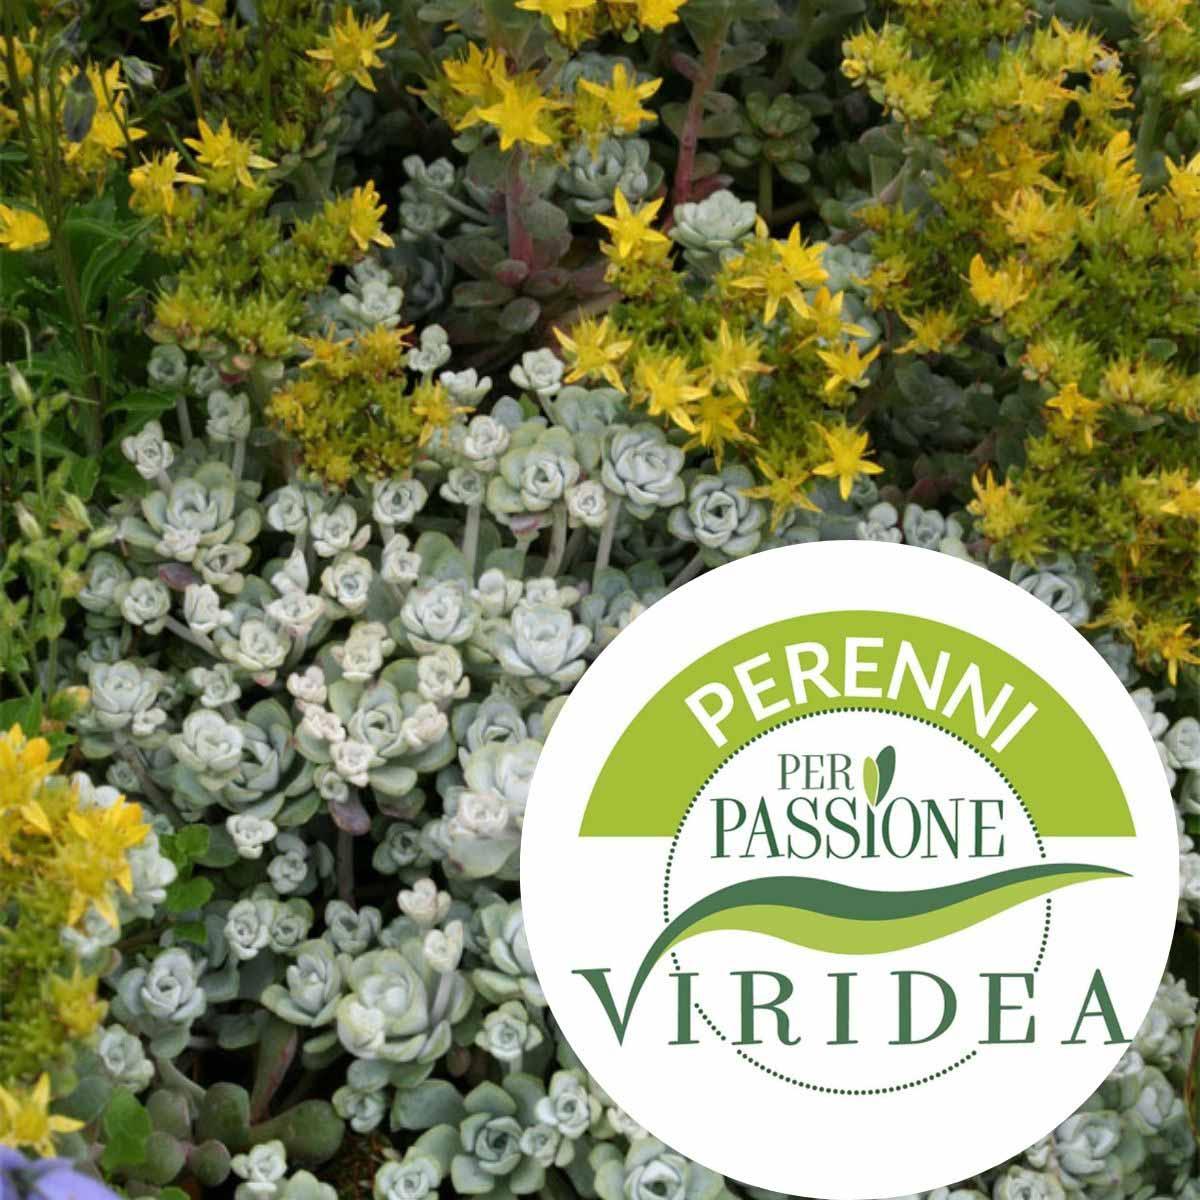 Linea Perenni per Passione – Sedum in varietà